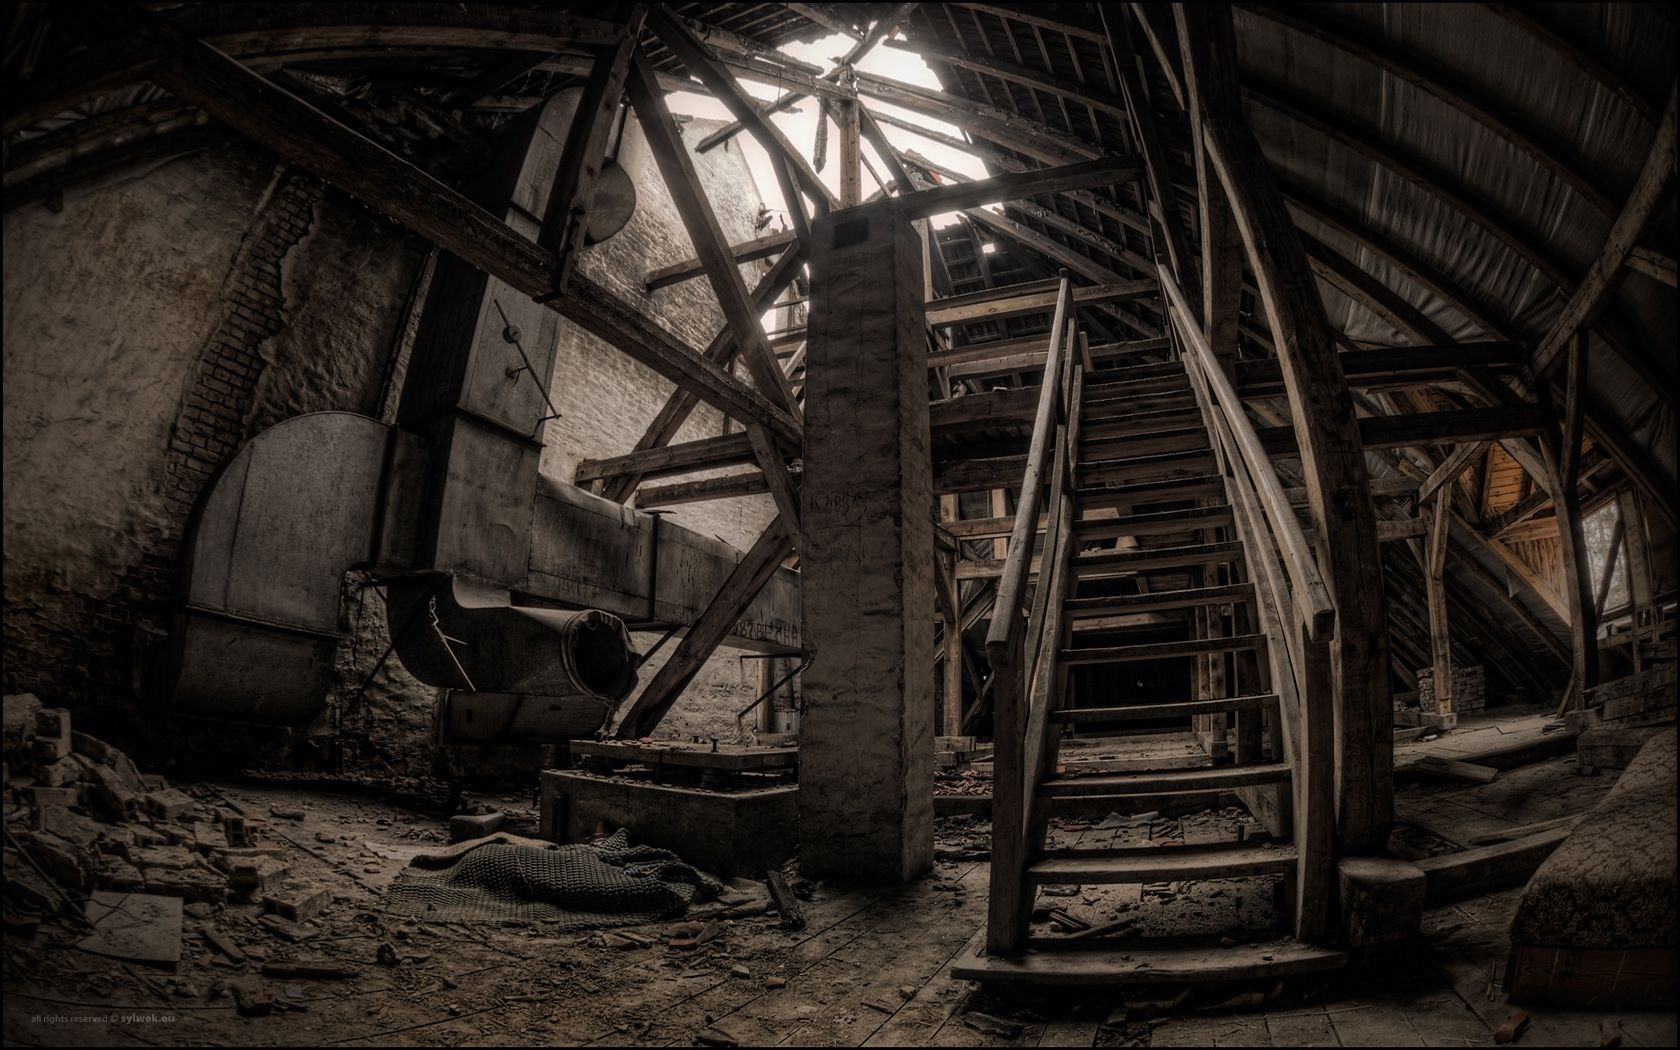 old_building_stairs_dark_nostalgic_construction_11138_1680x1050.jpg 1680×1050 pikseliä